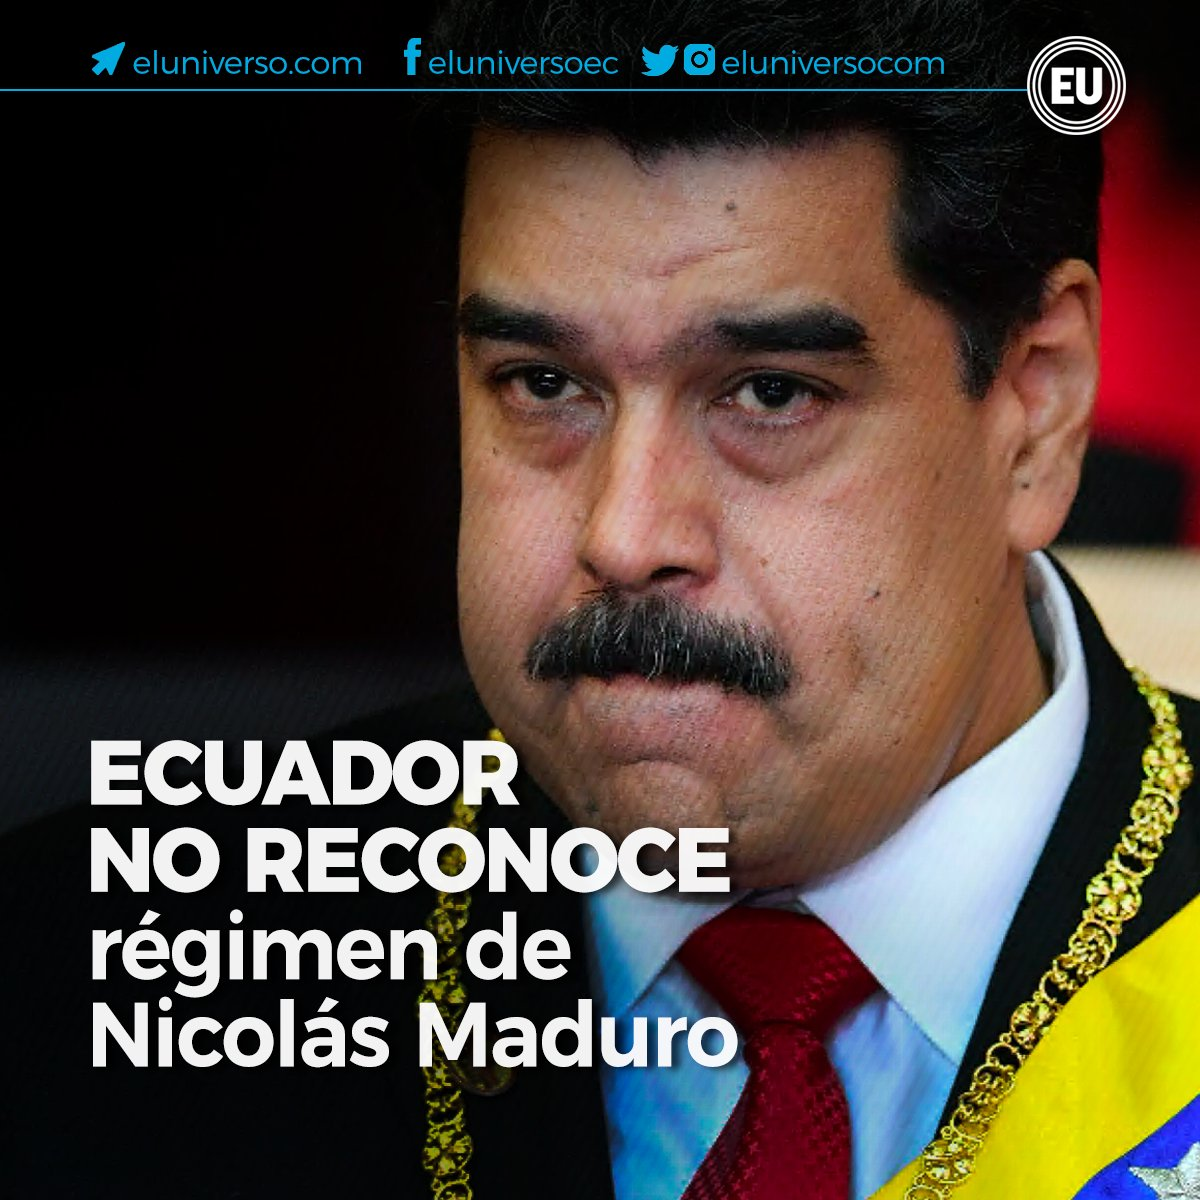 El Universo's photo on Nicolás Maduro